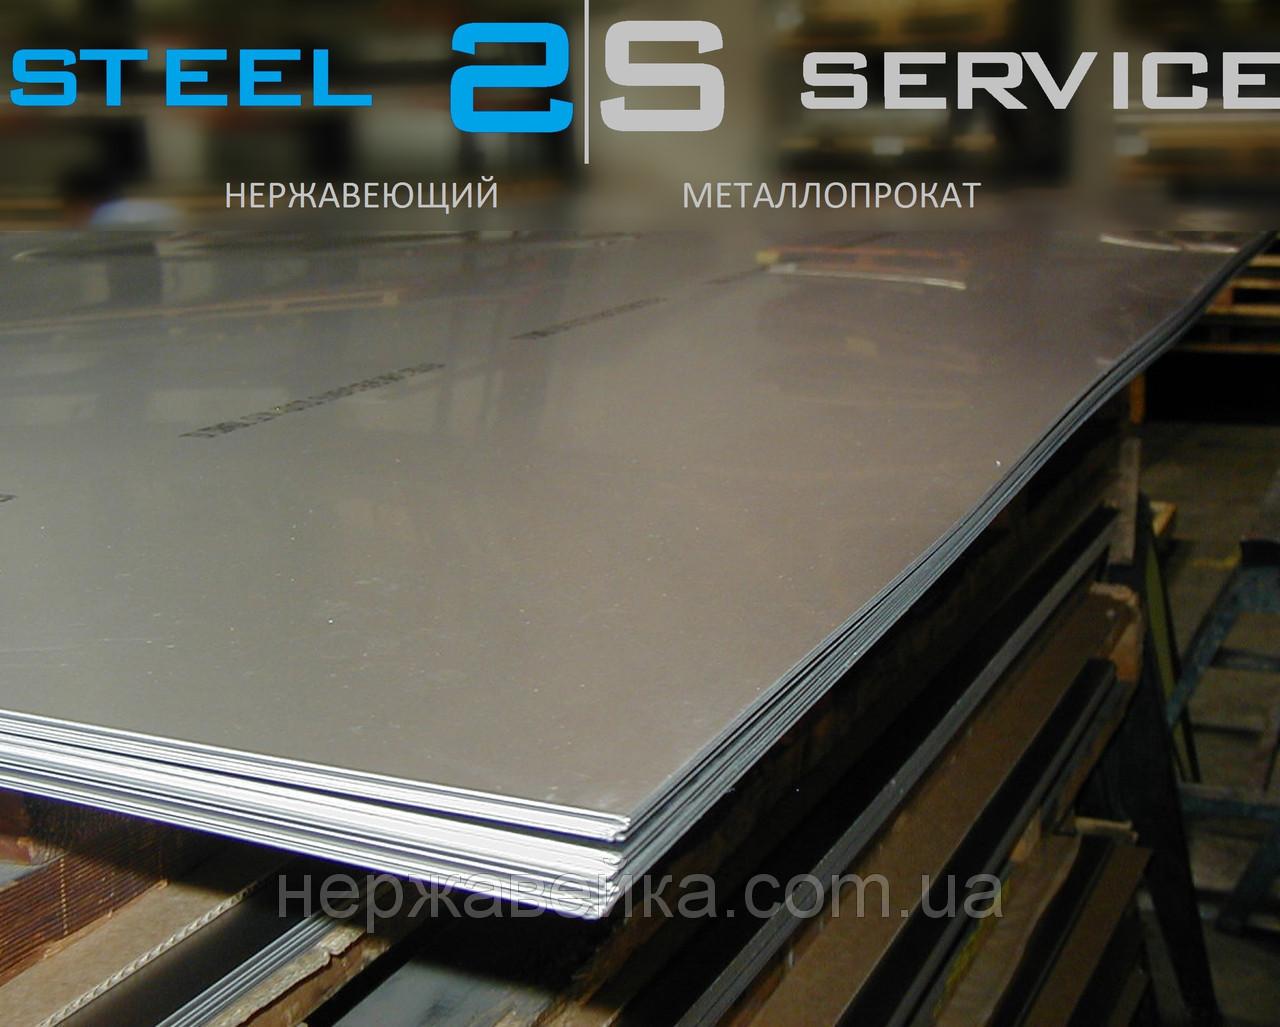 Листовая нержавейка 0,5х1250х2500мм  AISI 316L(03Х17Н14М3) 2B - матовый,  кислотостойкий